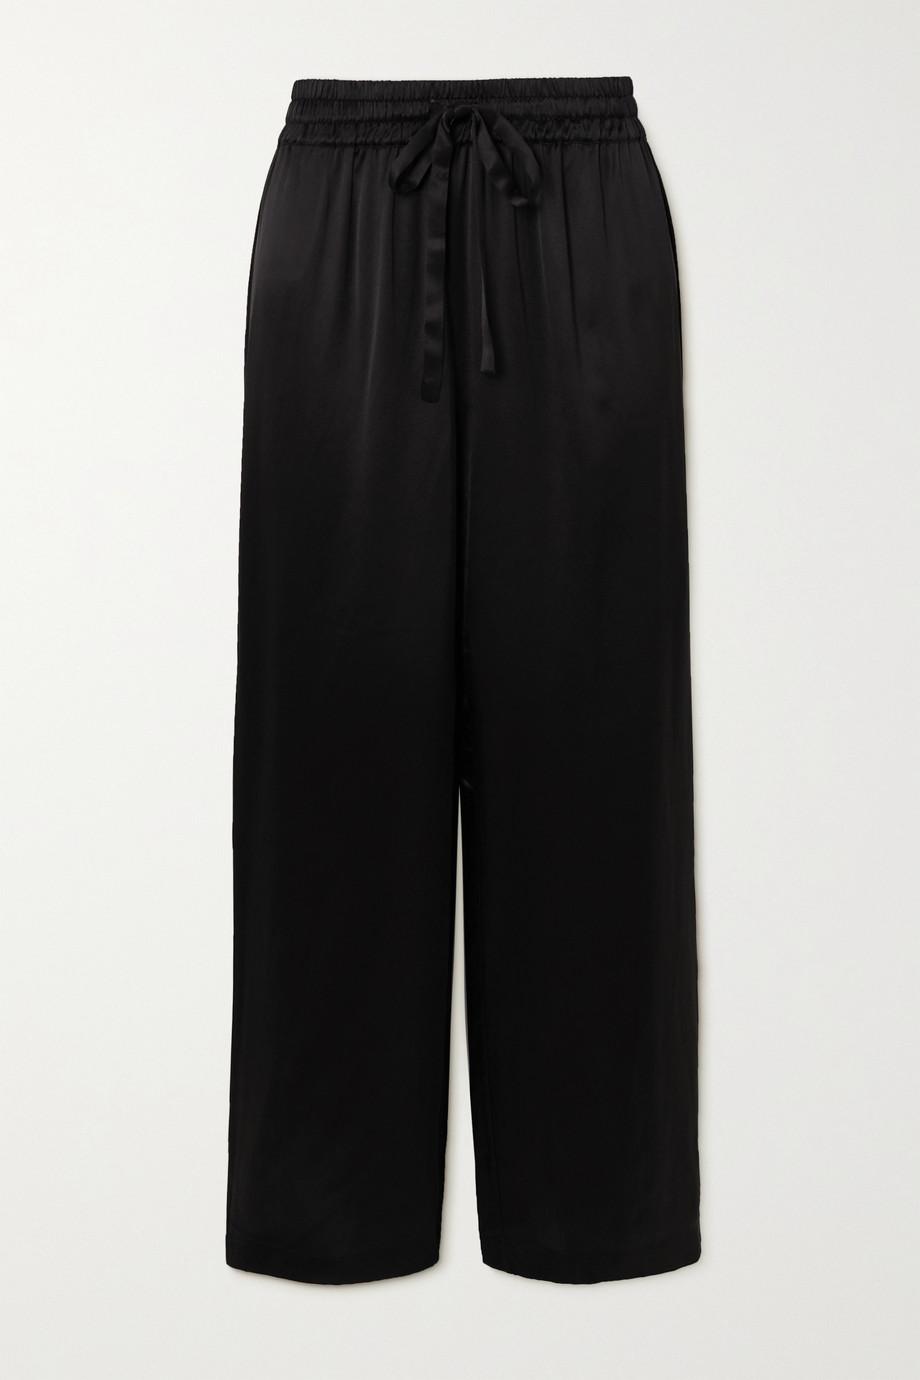 Maison Essentiele Jasmine silk-satin pajama pants